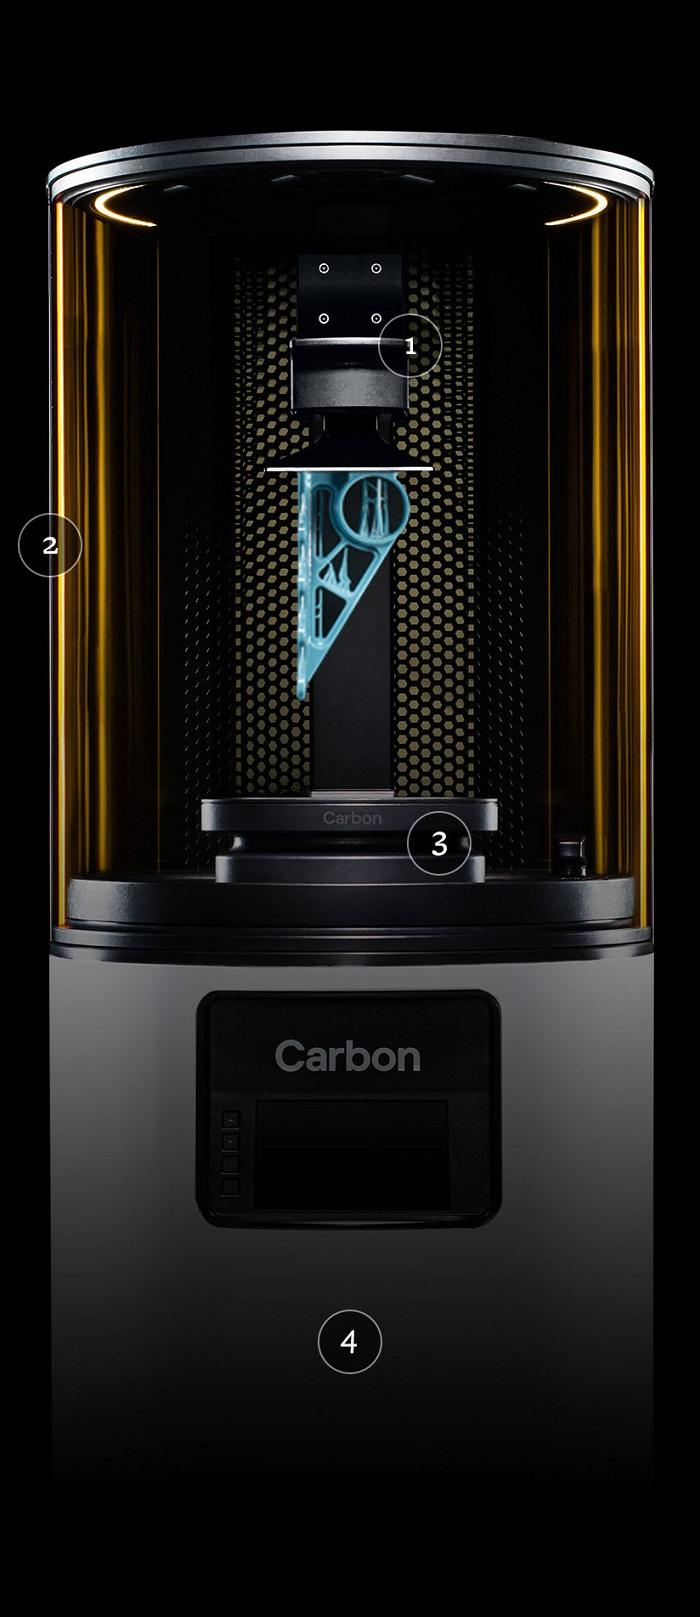 Carbon M1 3Dプリンター 光造形